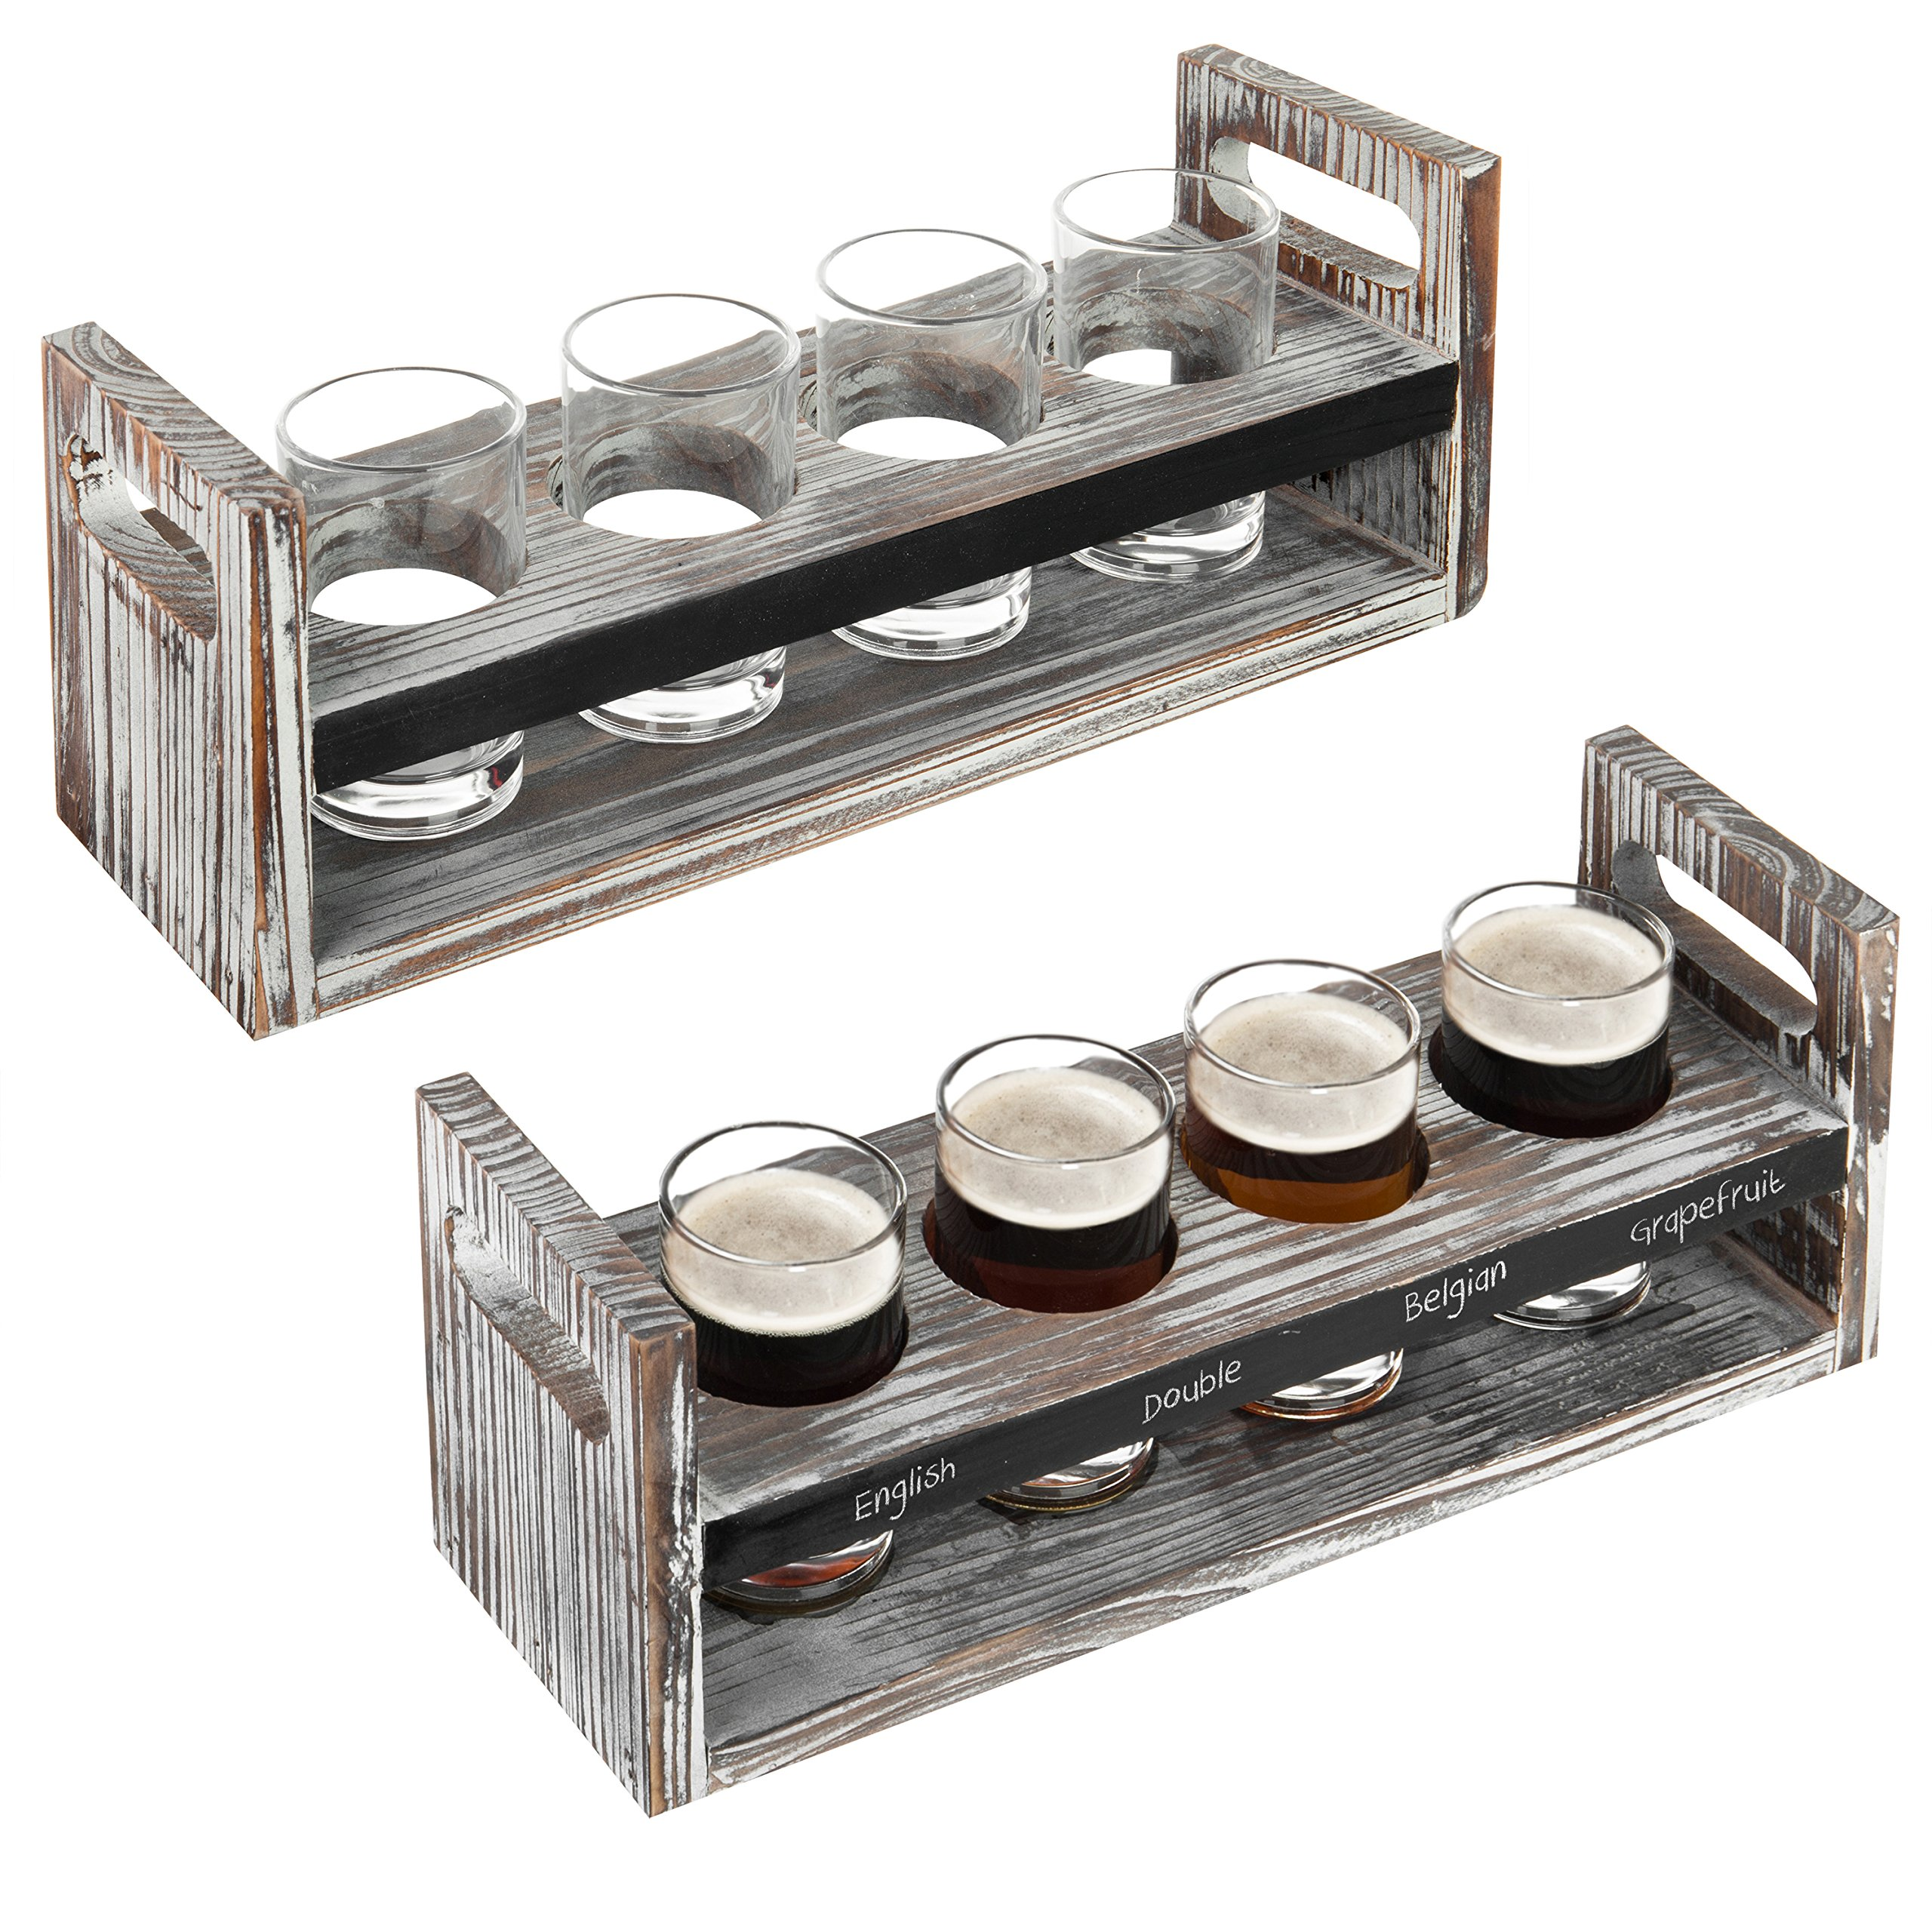 MyGift Set of 2 Torched Wood Beer Flight Serving Caddies with Chalkboard Panels & 4 Tasting Glasses